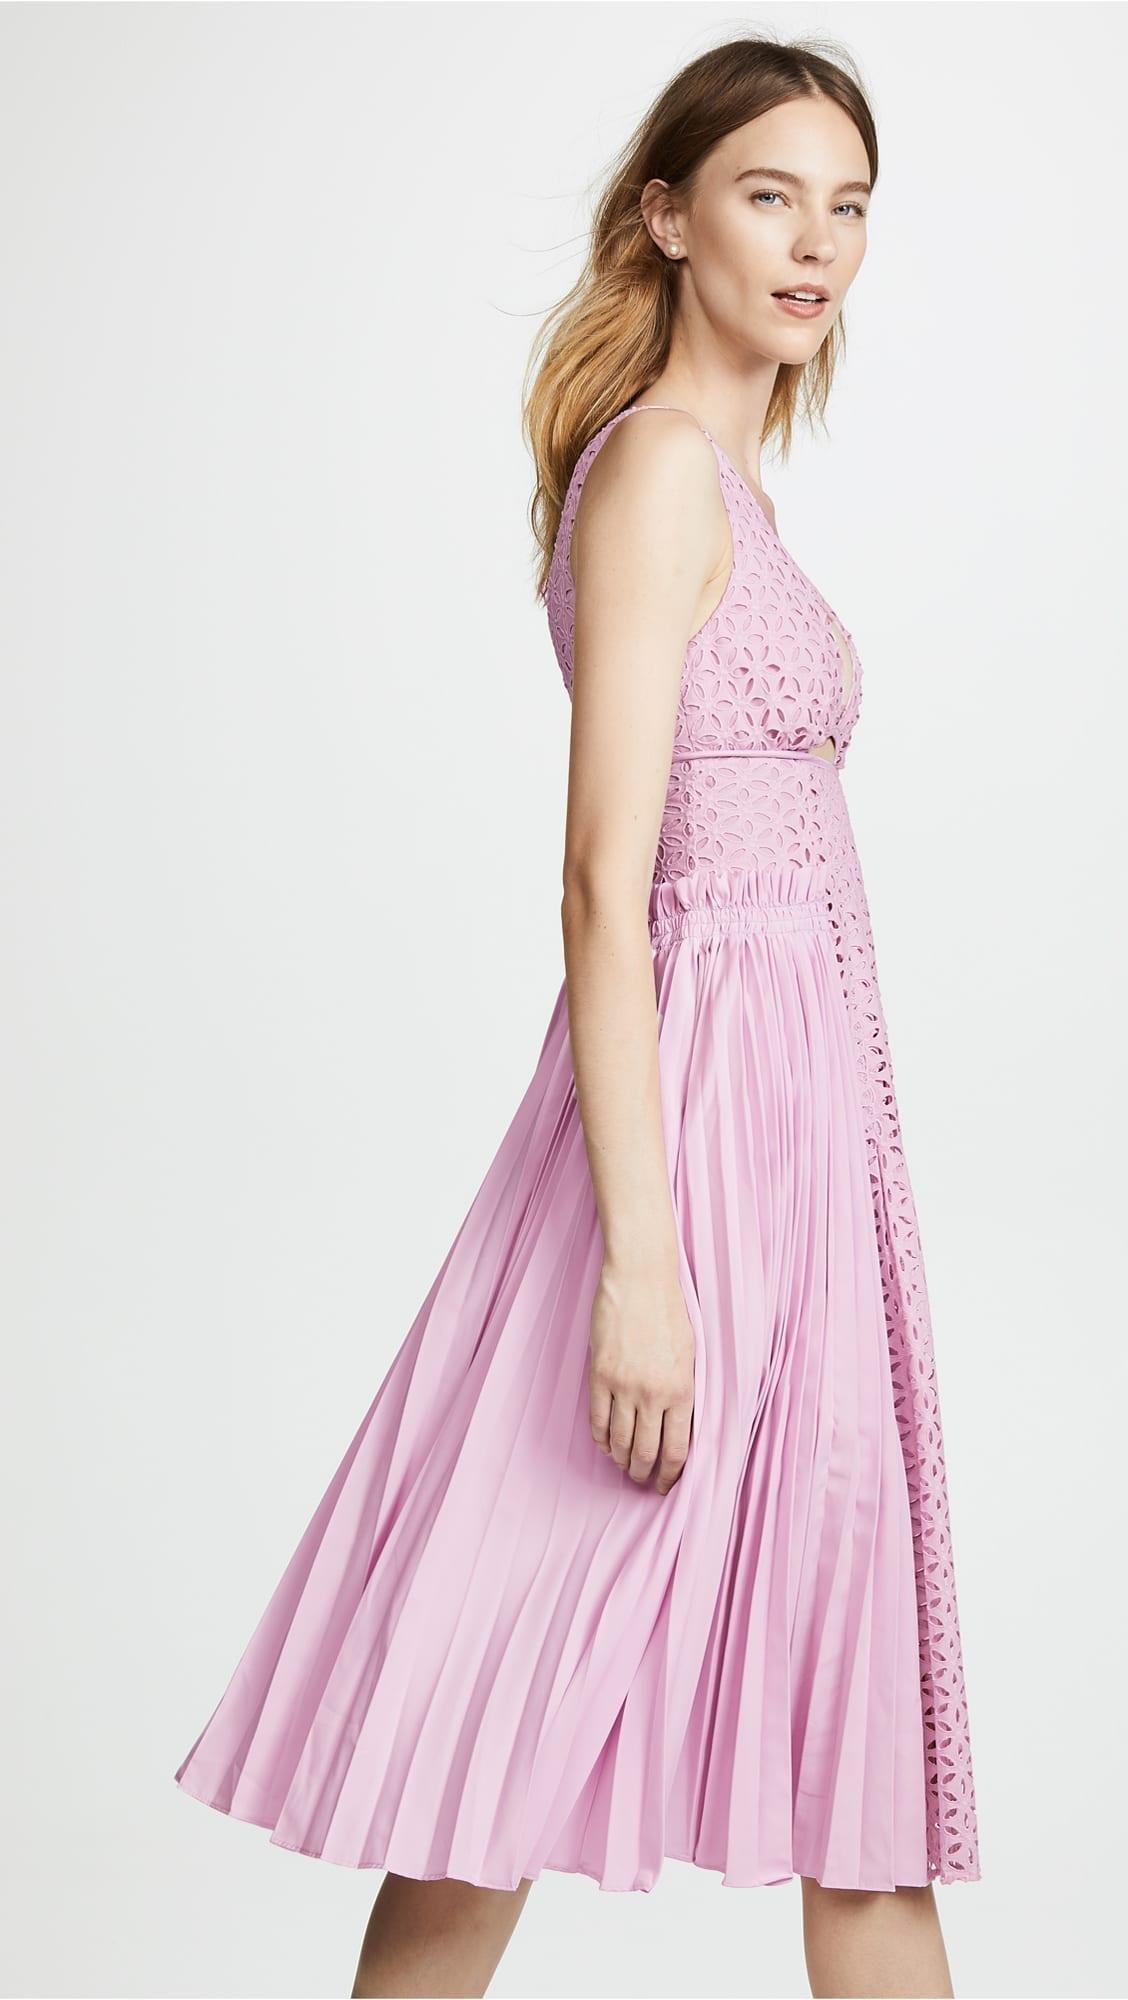 SELF PORTRAIT Midi Lilac Dress - We Select Dresses